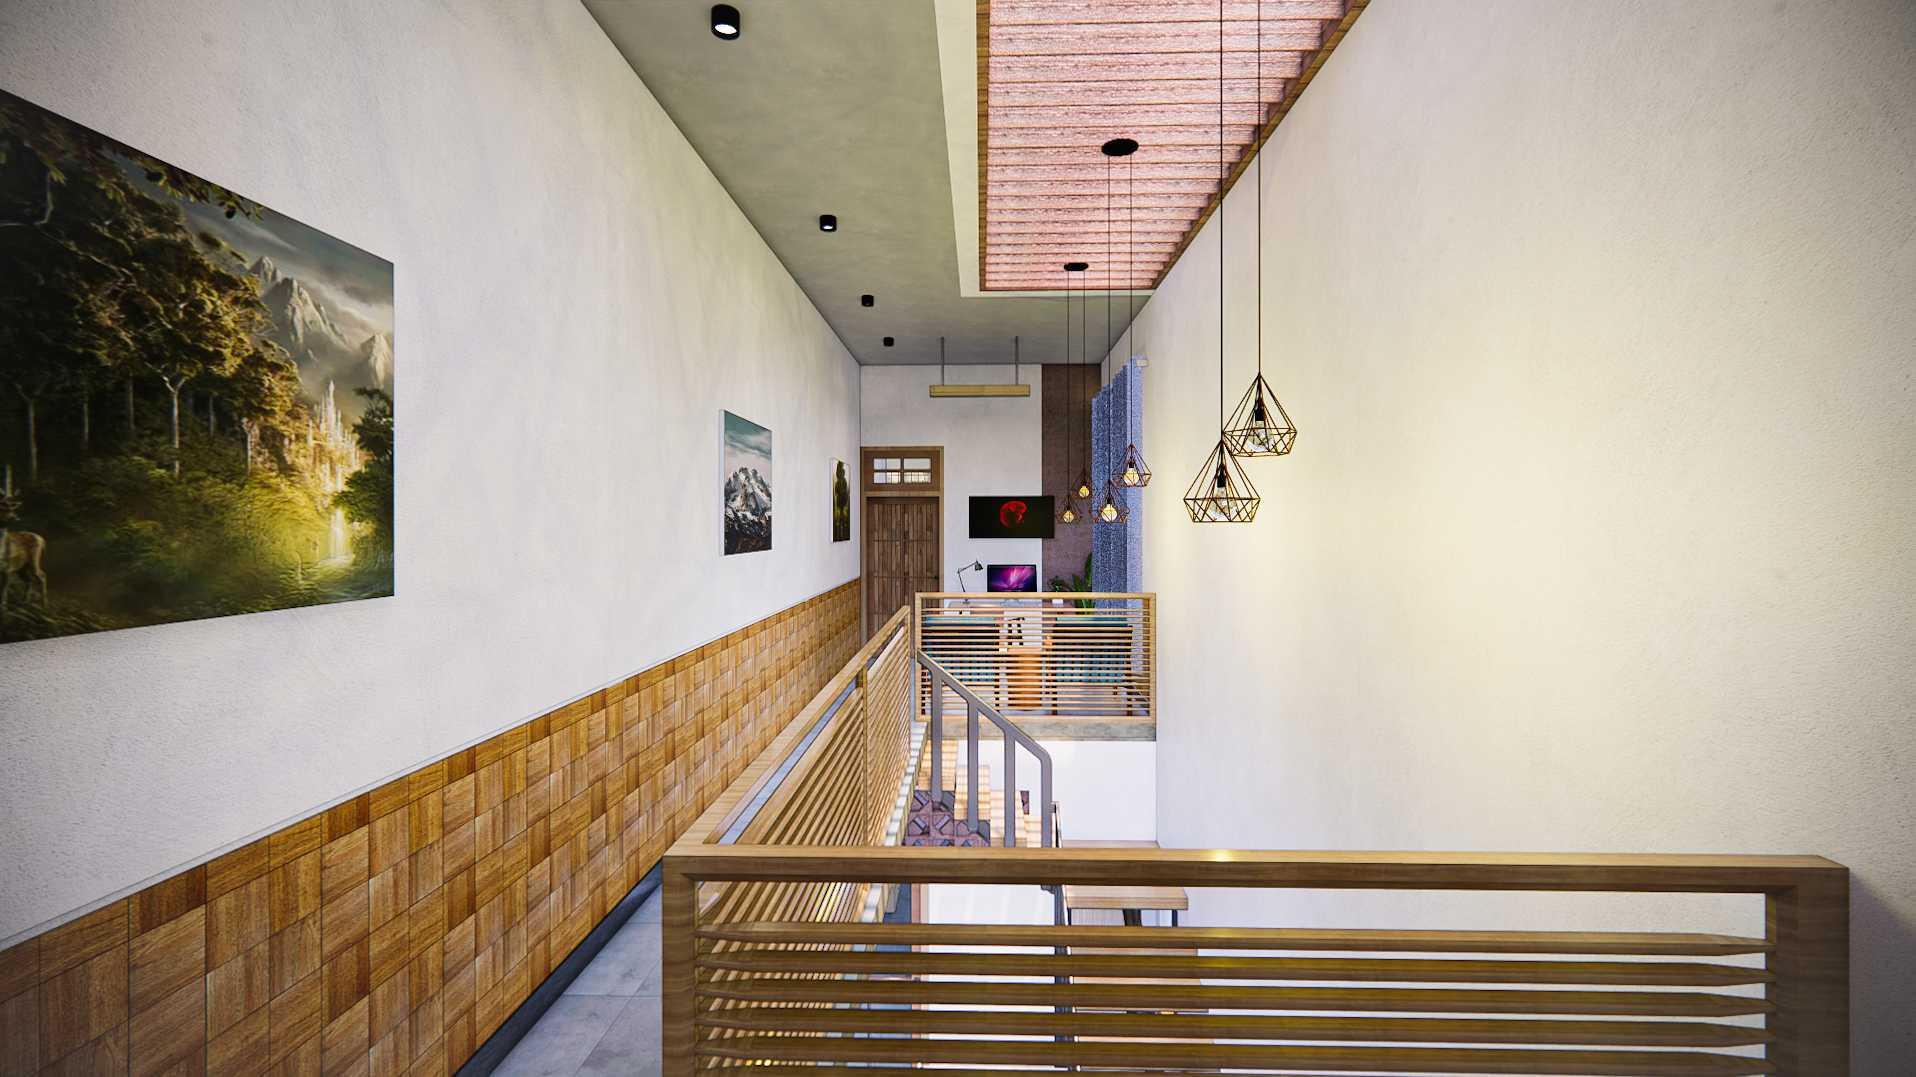 Biliksrawung Biliksrawung Architecture Studio Office Mojolebak, Kec. Jetis, Mojokerto, Jawa Timur, Indonesia Mojolebak, Kec. Jetis, Mojokerto, Jawa Timur, Indonesia Biliksrawung-Biliksrawung-Architecture-Studio-Office   130287